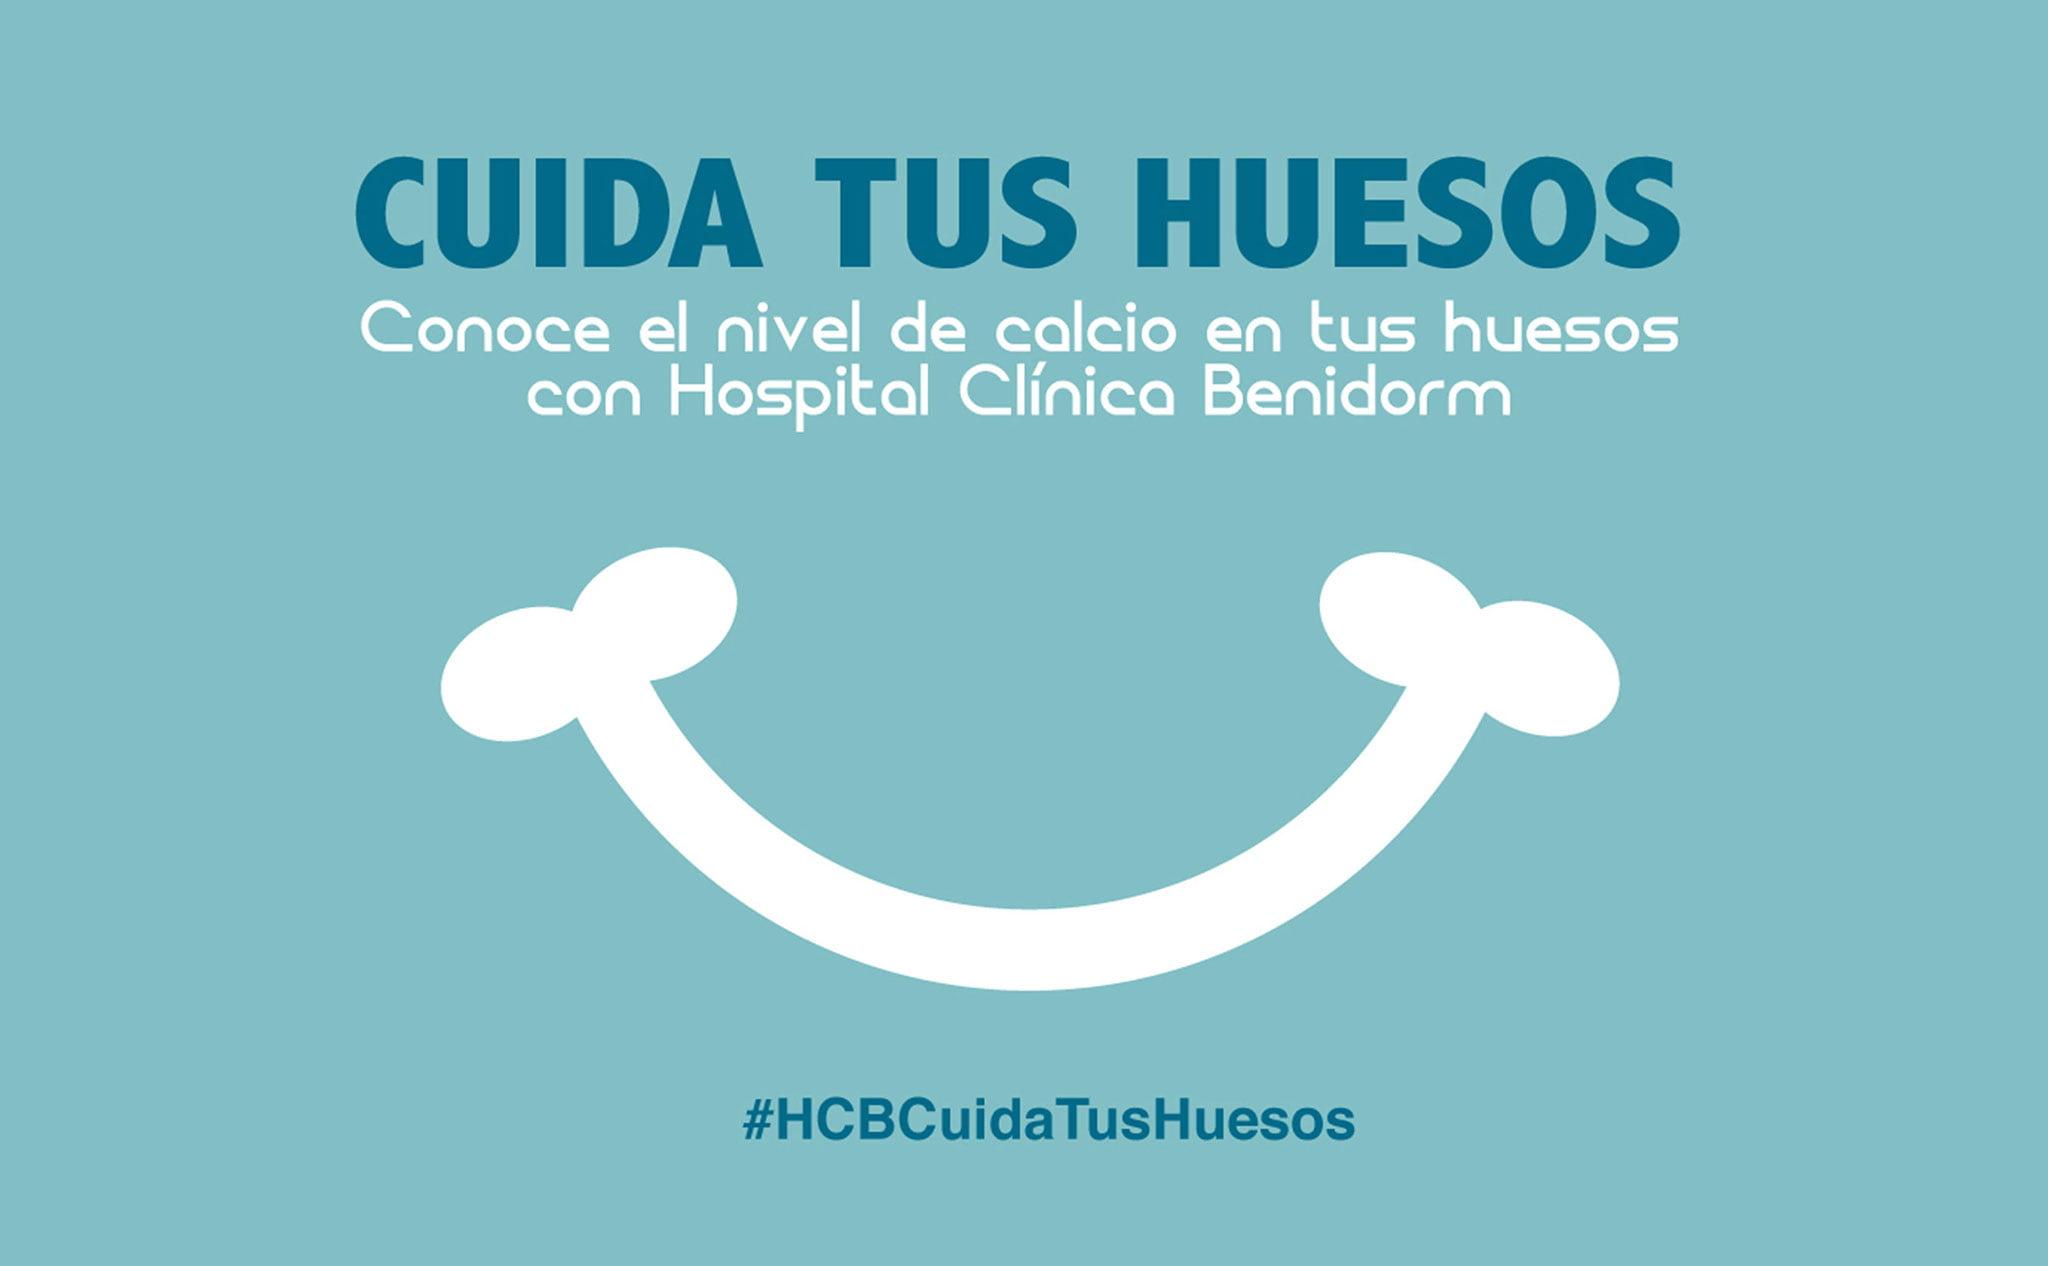 «Cuida tus huesos» – Hospital Clínica Benidorm (HCB)